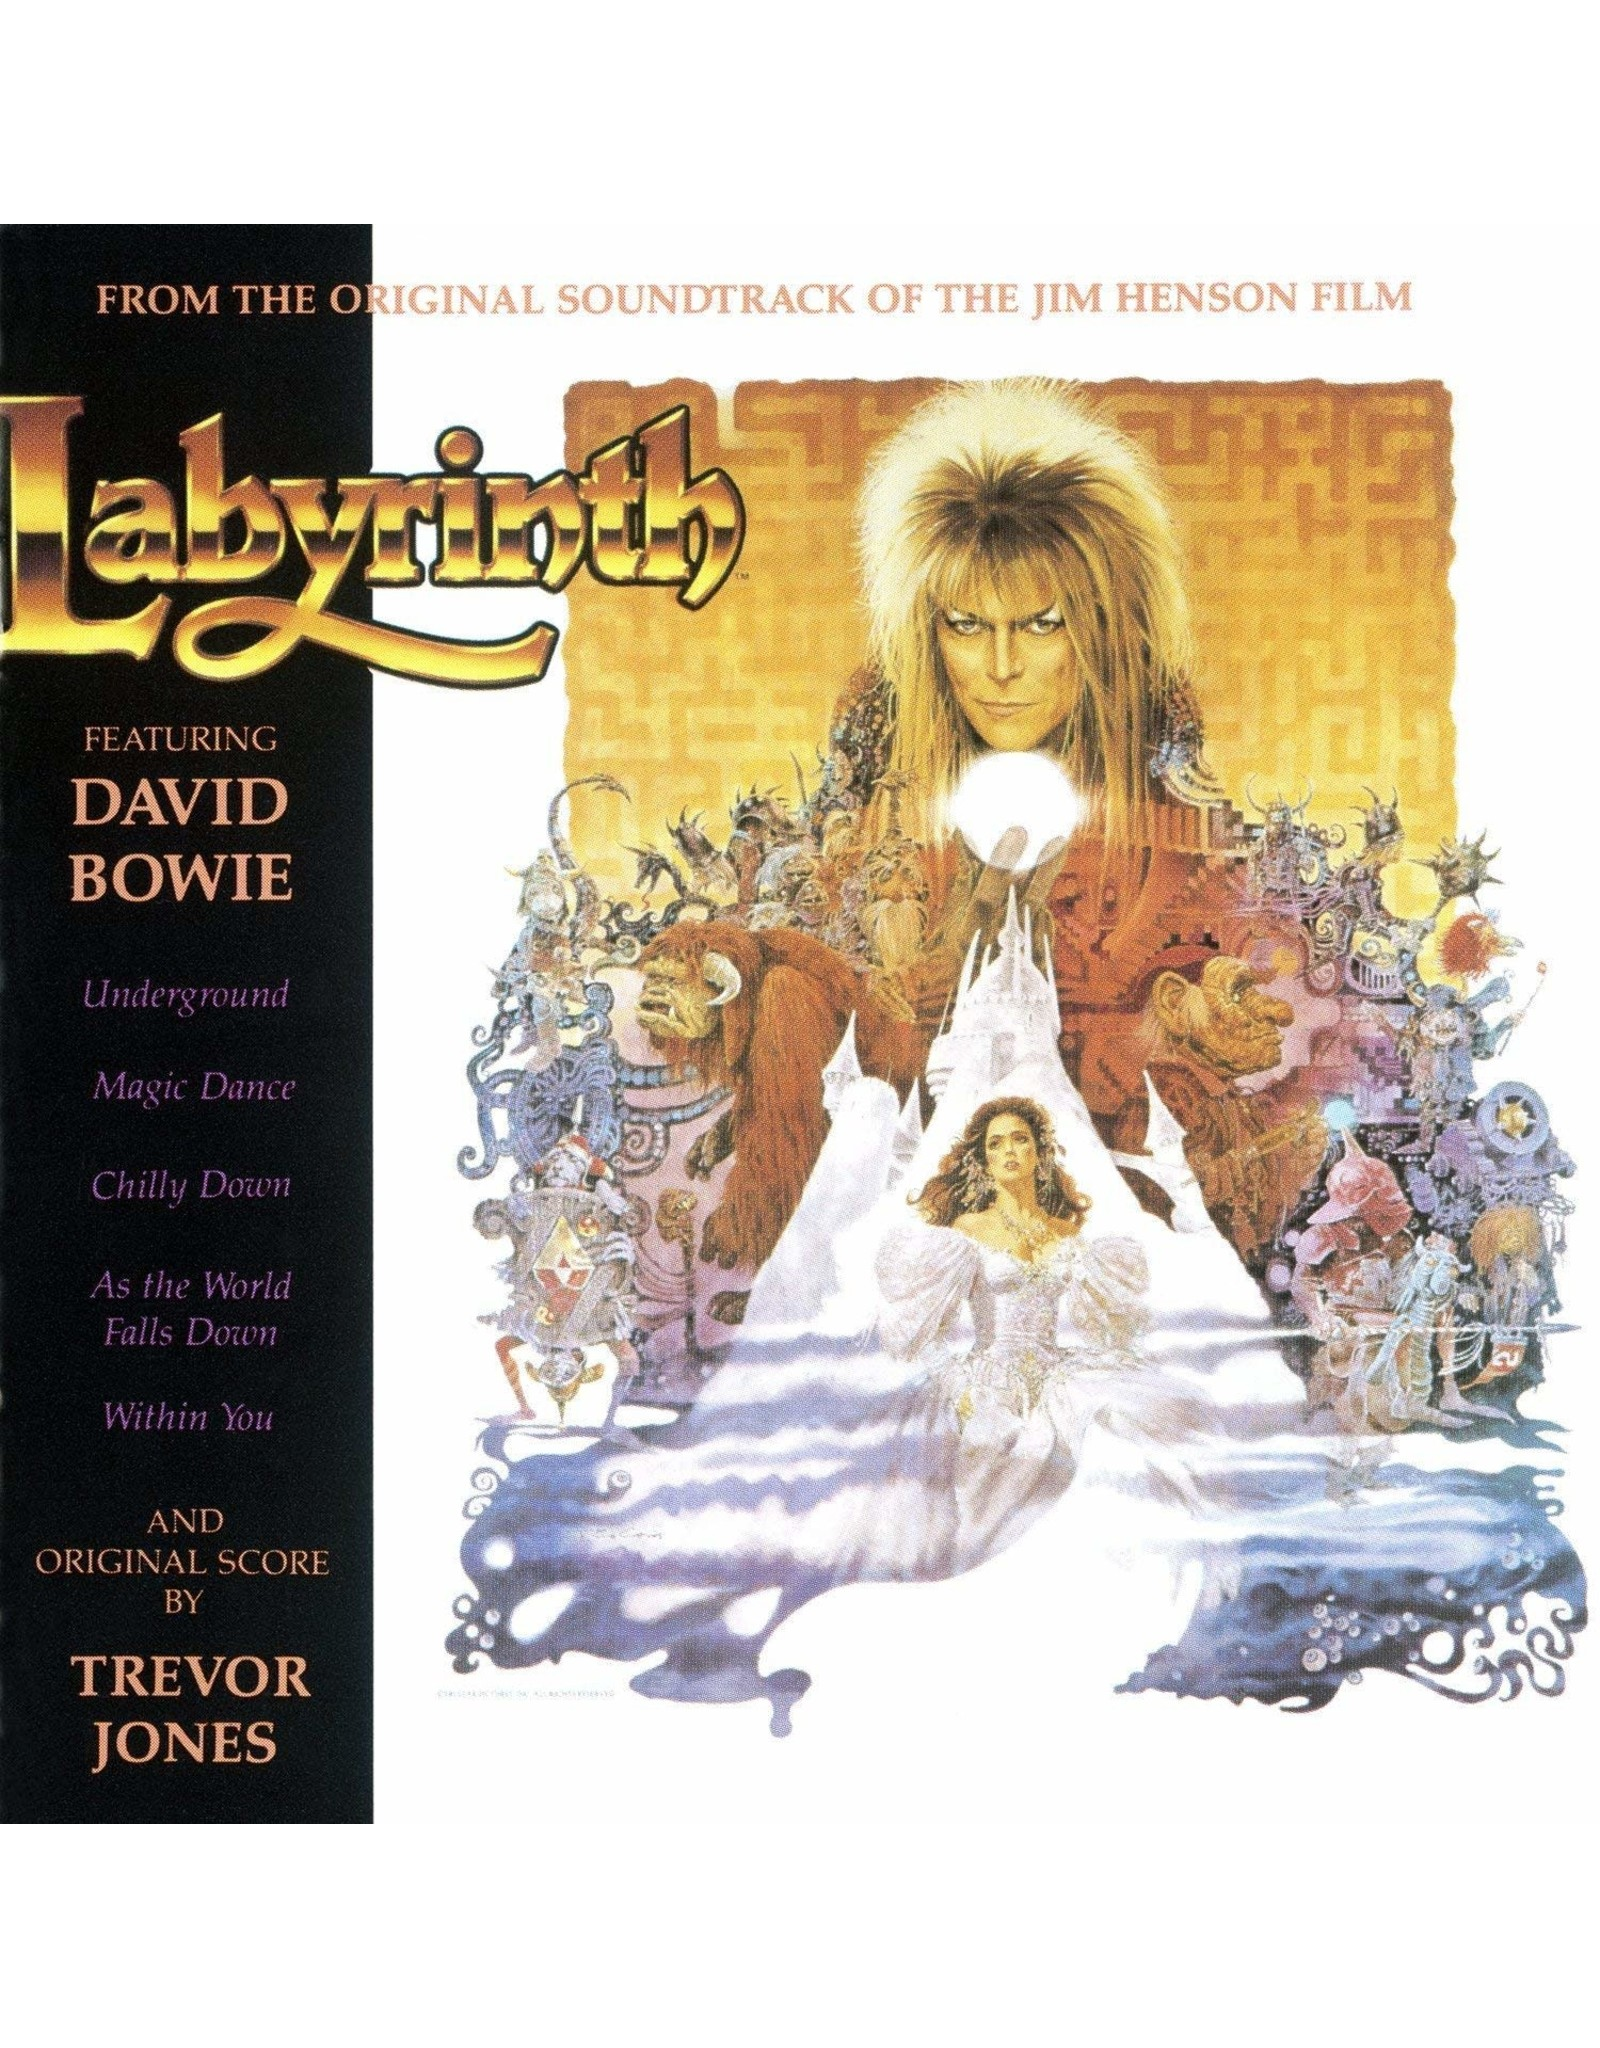 David Bowie / Trevor Jones - Labyrinth (Original Motion Picture Soundtrack)